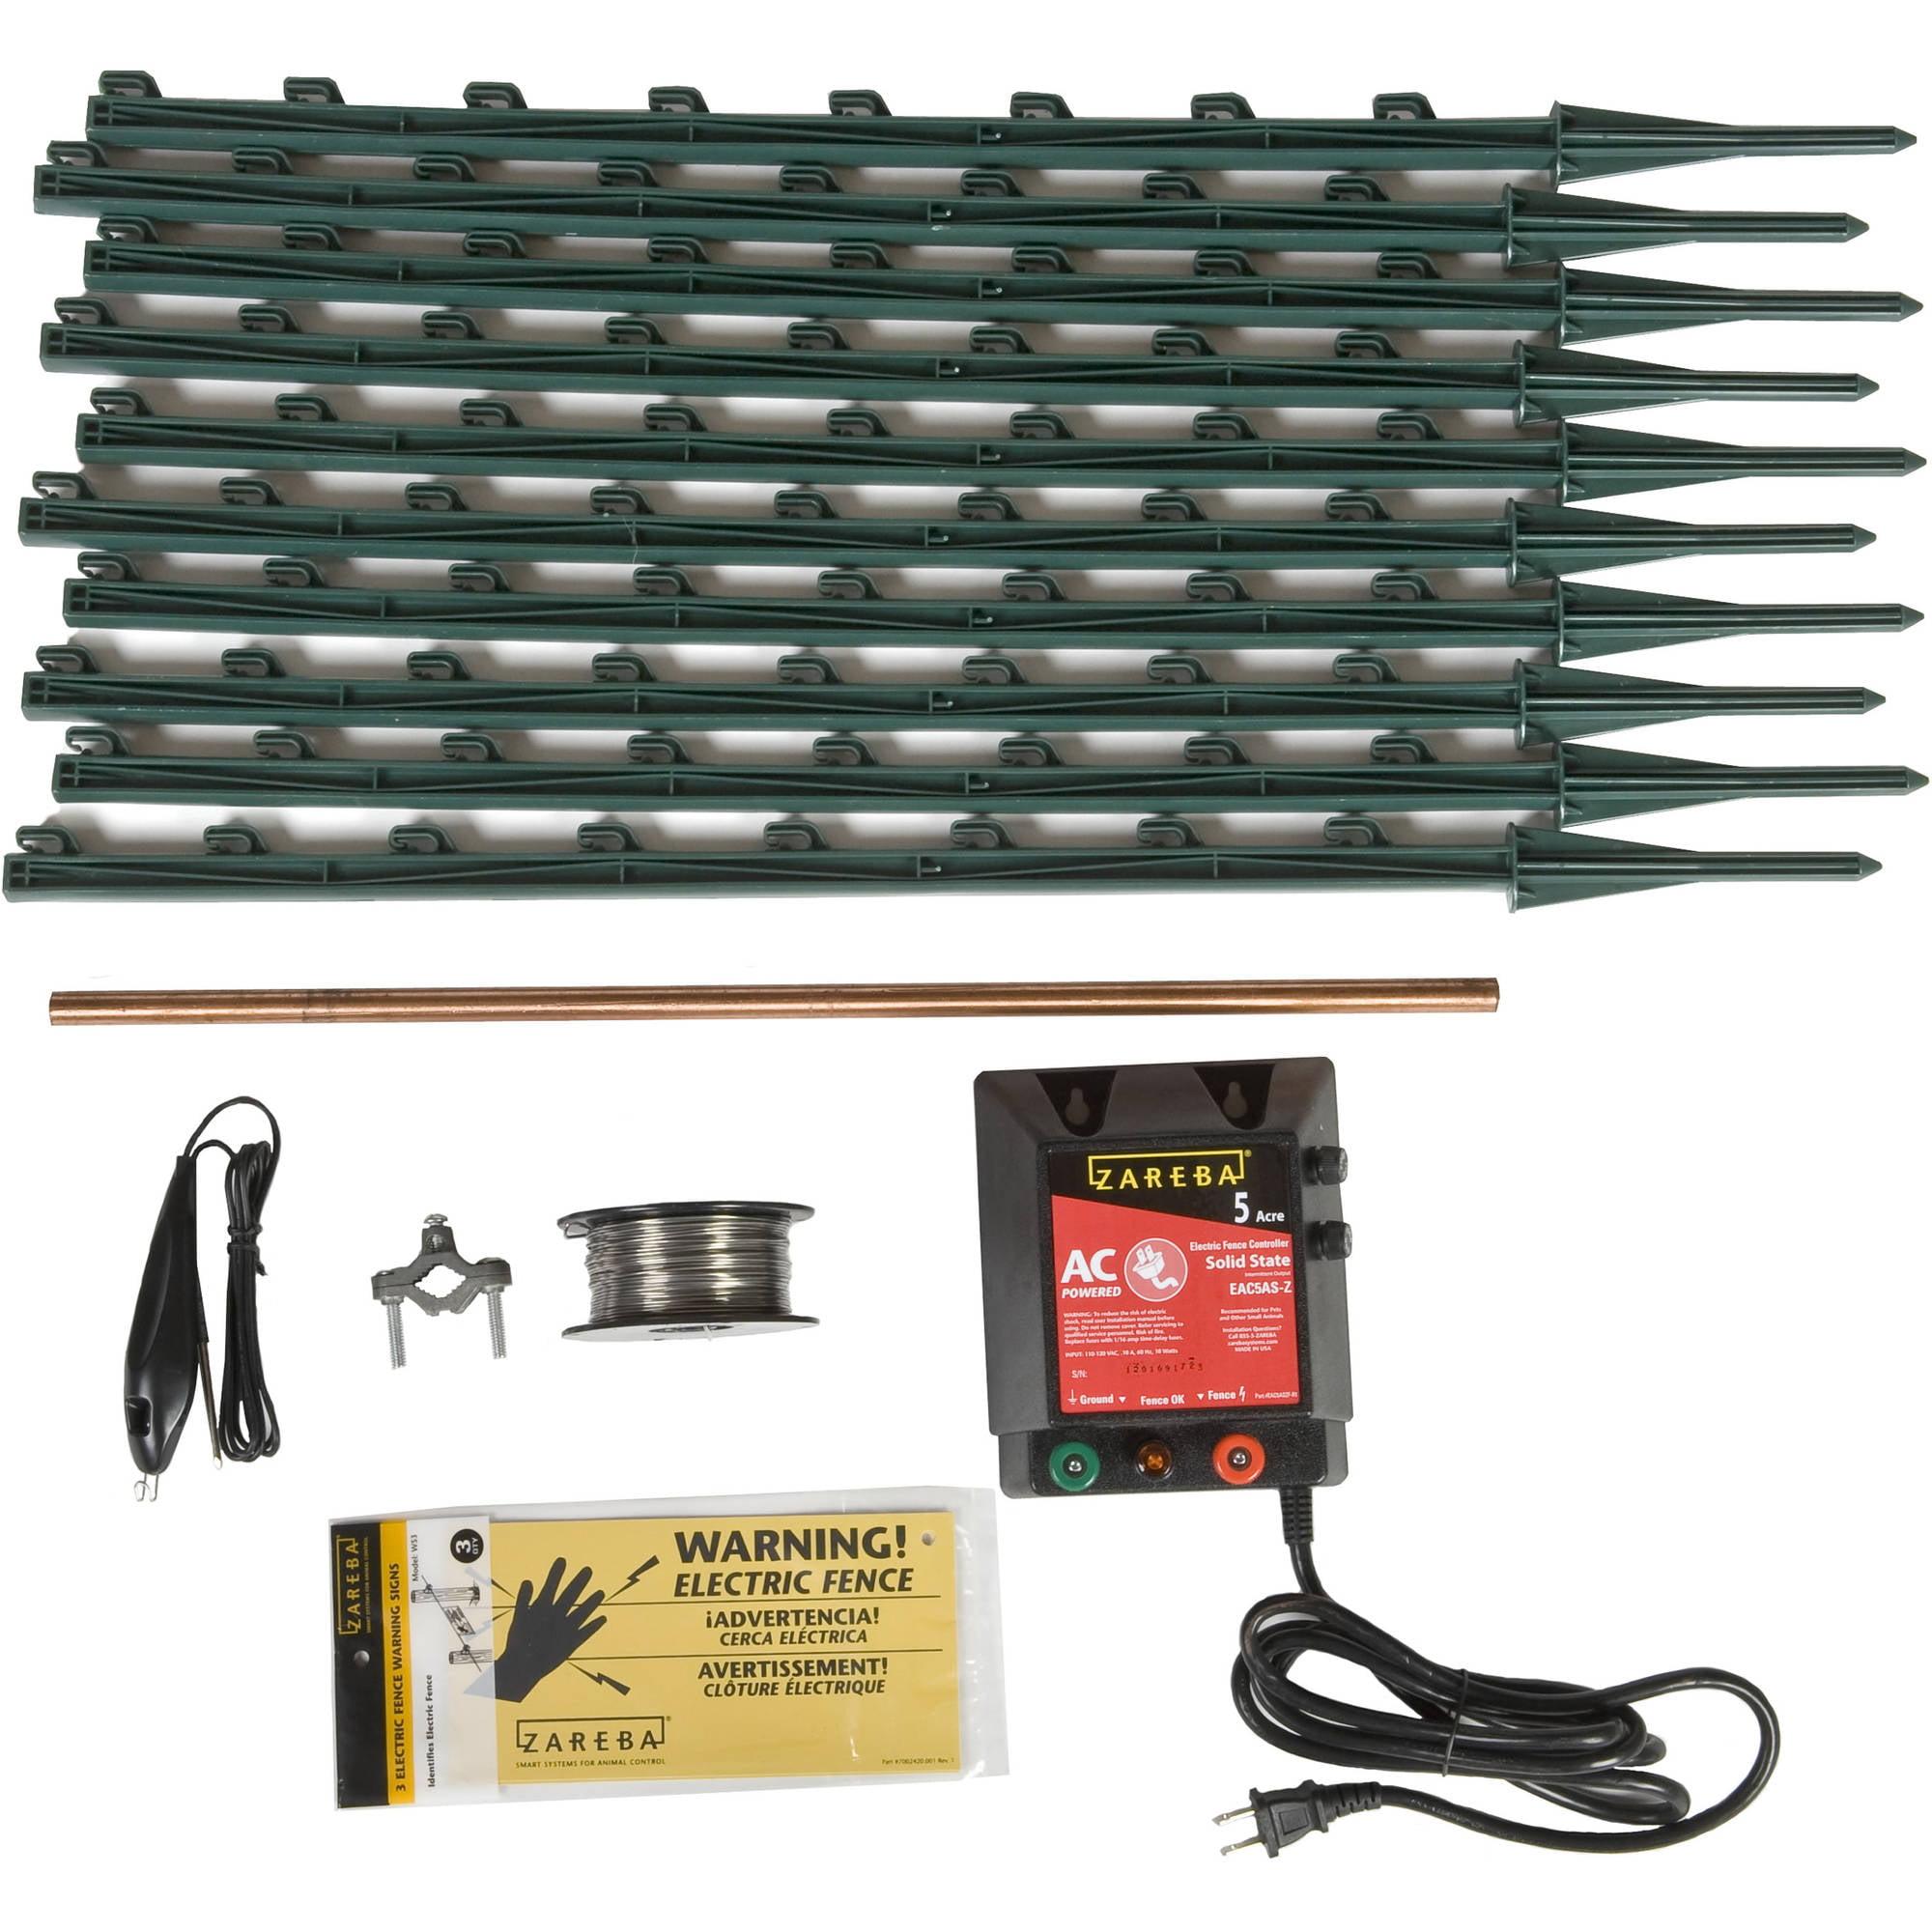 Zareba AC Garden Protector Electric Fence Kit Walmartcom